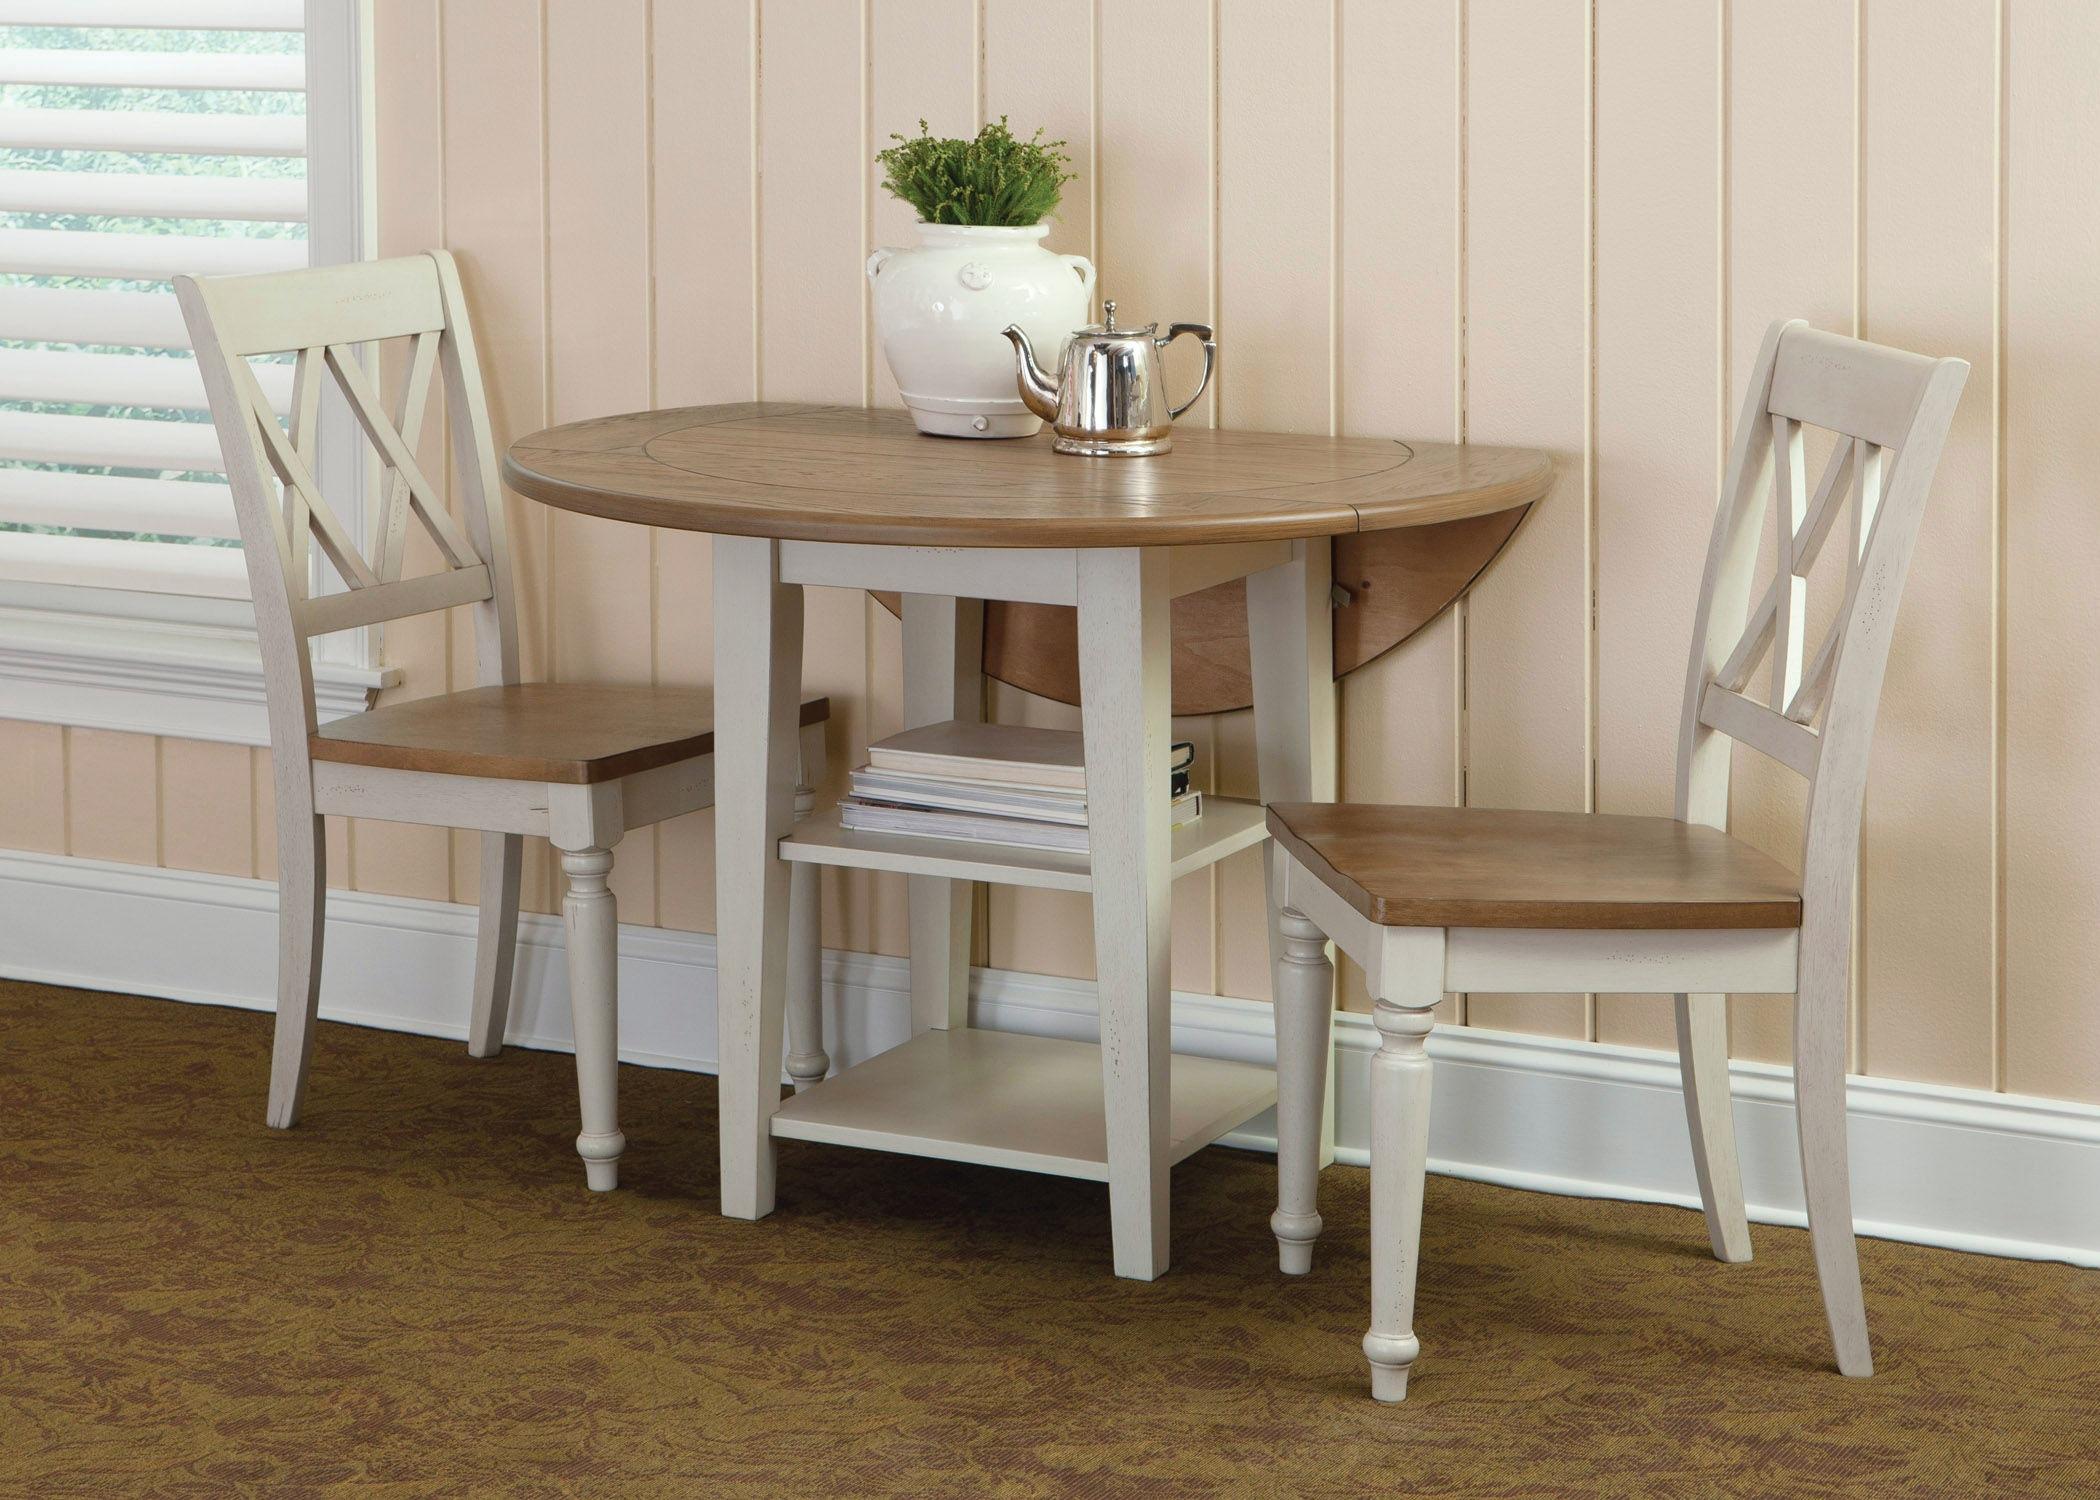 Merveilleux Liberty Furniture Opt 3 Piece Drop Leaf Table Set 841 CD O3DLS